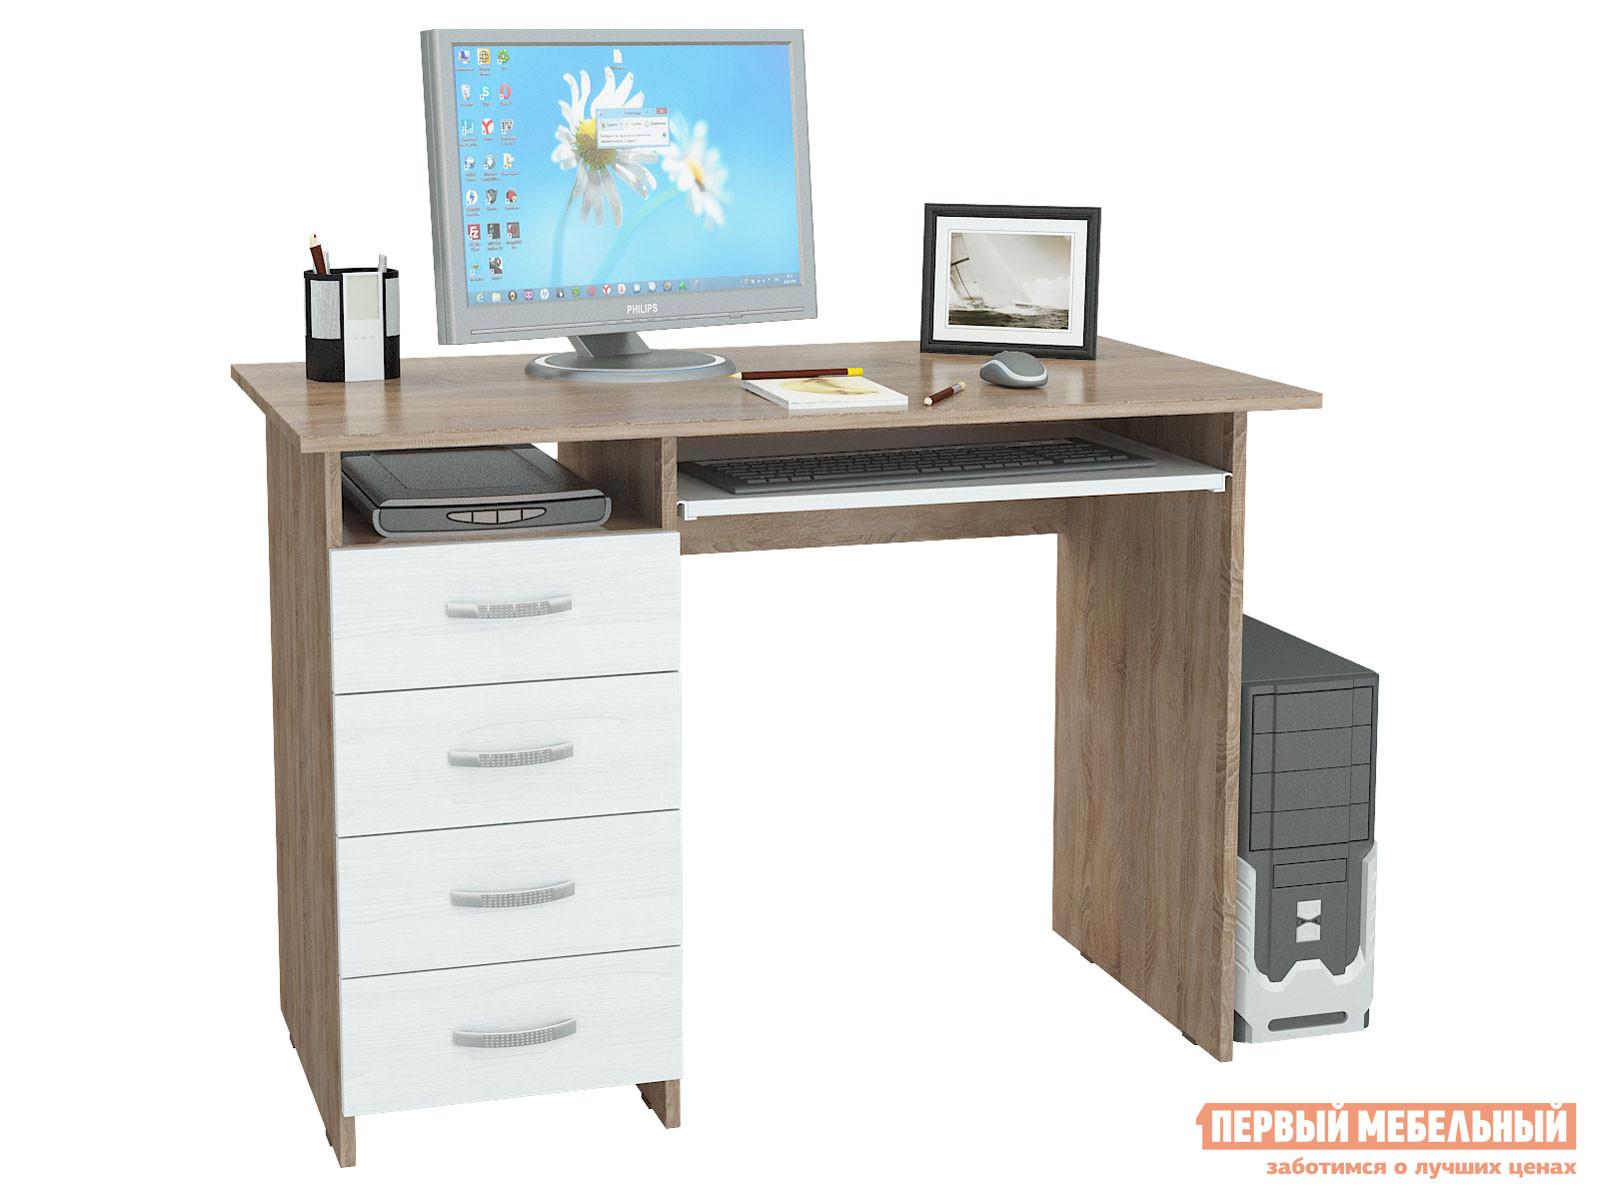 Компьютерный стол МФ Мастер Милан-3 компьютерный стол мф мастер тандем 3 белый